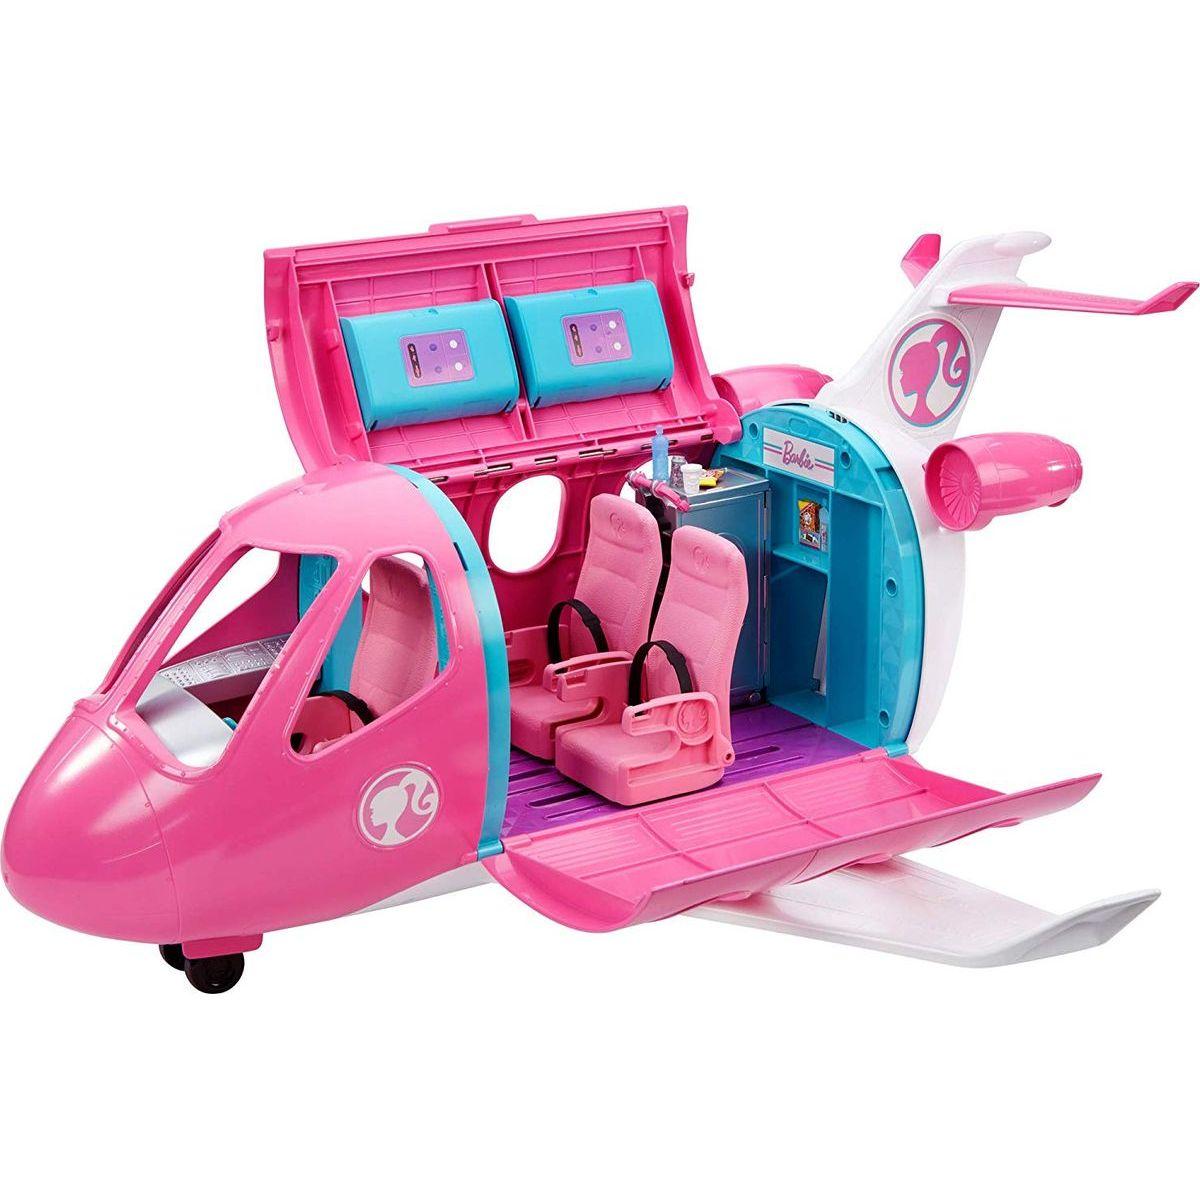 Mattel Barbie letadlo snů